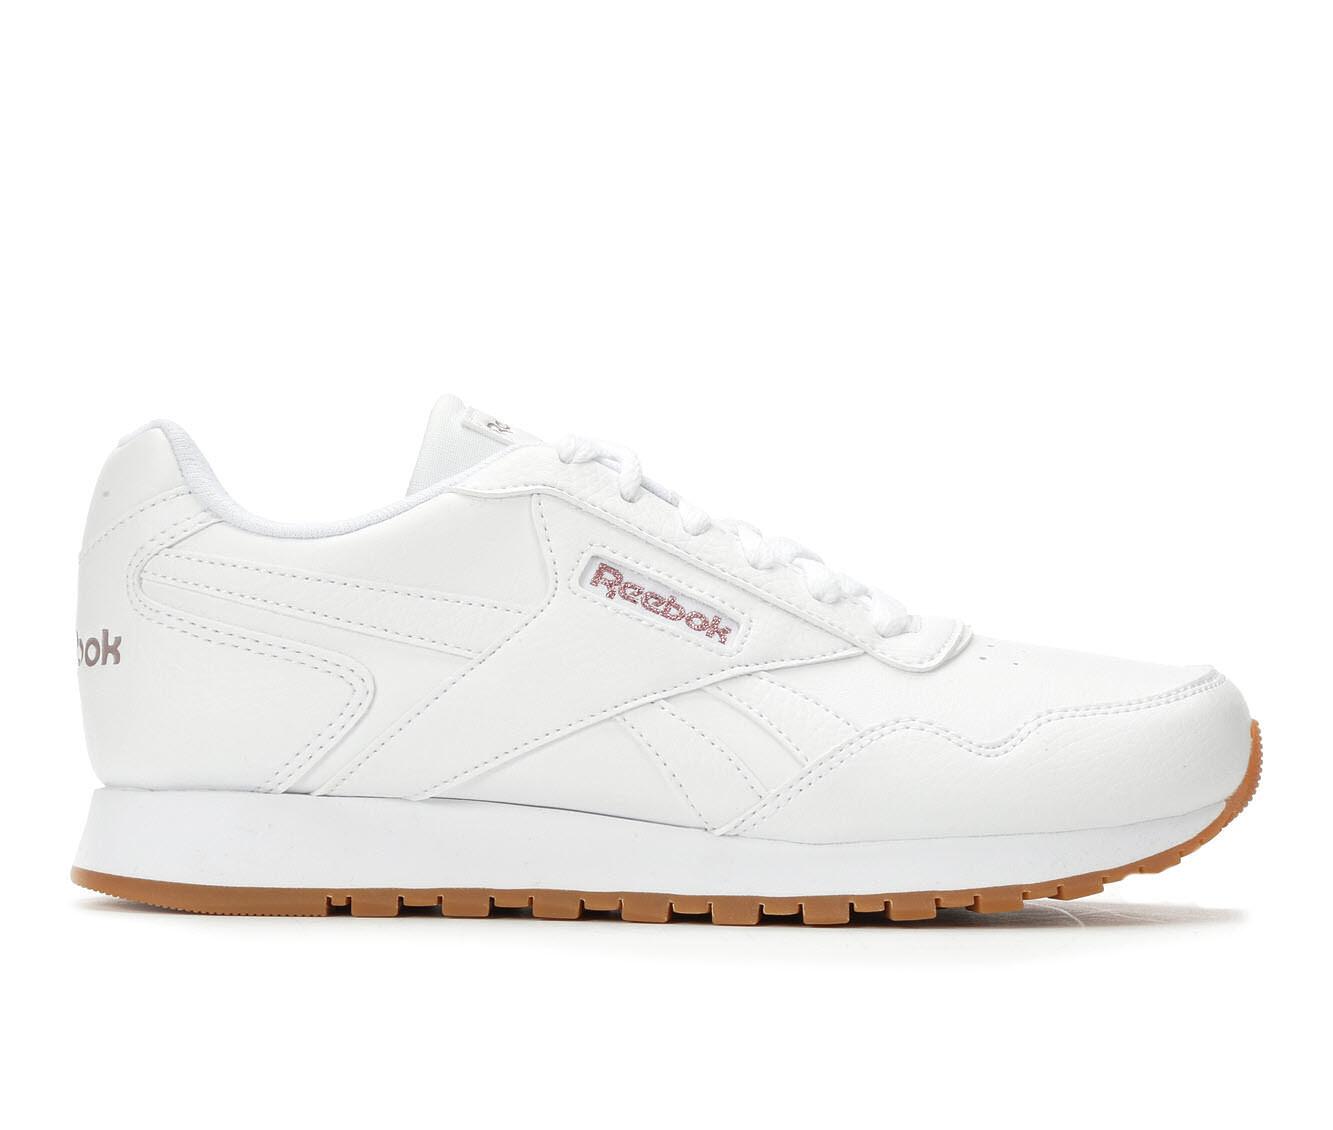 Women's Reebok Classic Harman Run Retro Sneakers White/Rose/Gum